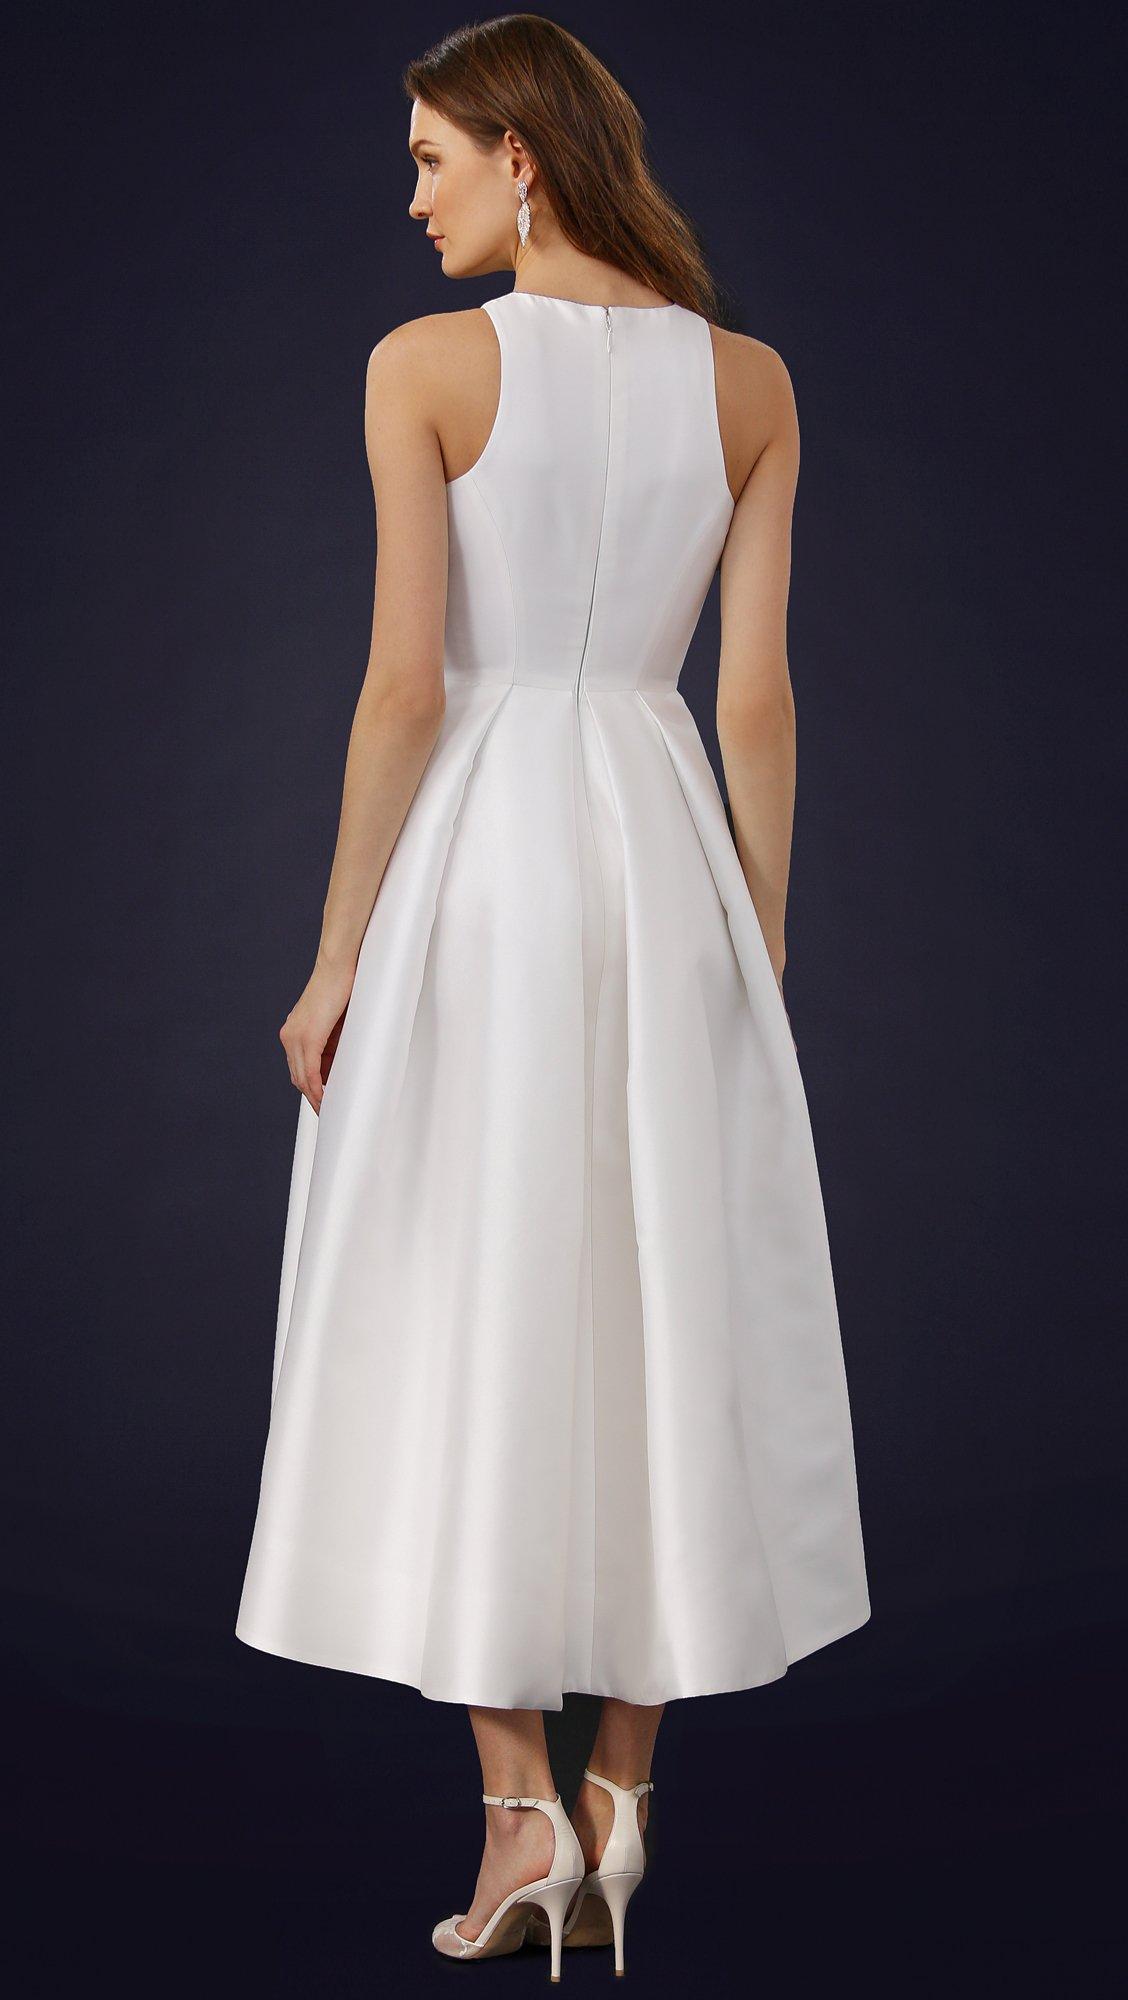 Monique Lhuillier Zelda Tea Length Dress In White Silk